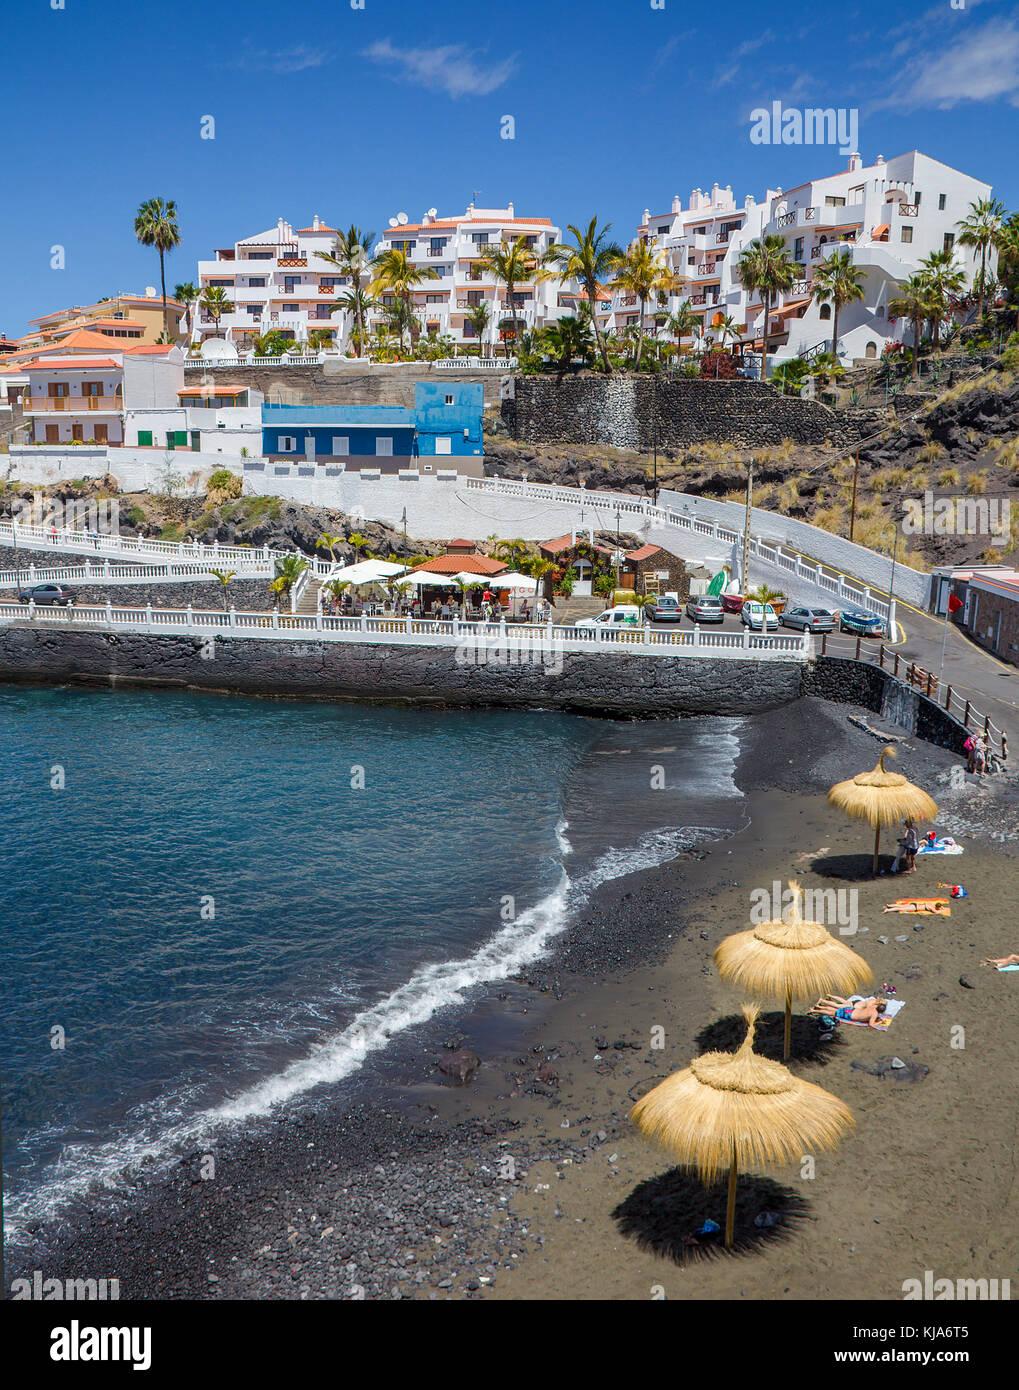 Winzig dunklen Strand (Piscina los chocos) am Dorf Puerto de Santiago, Teneriffa, Kanarische Inseln, Spanien Stockbild